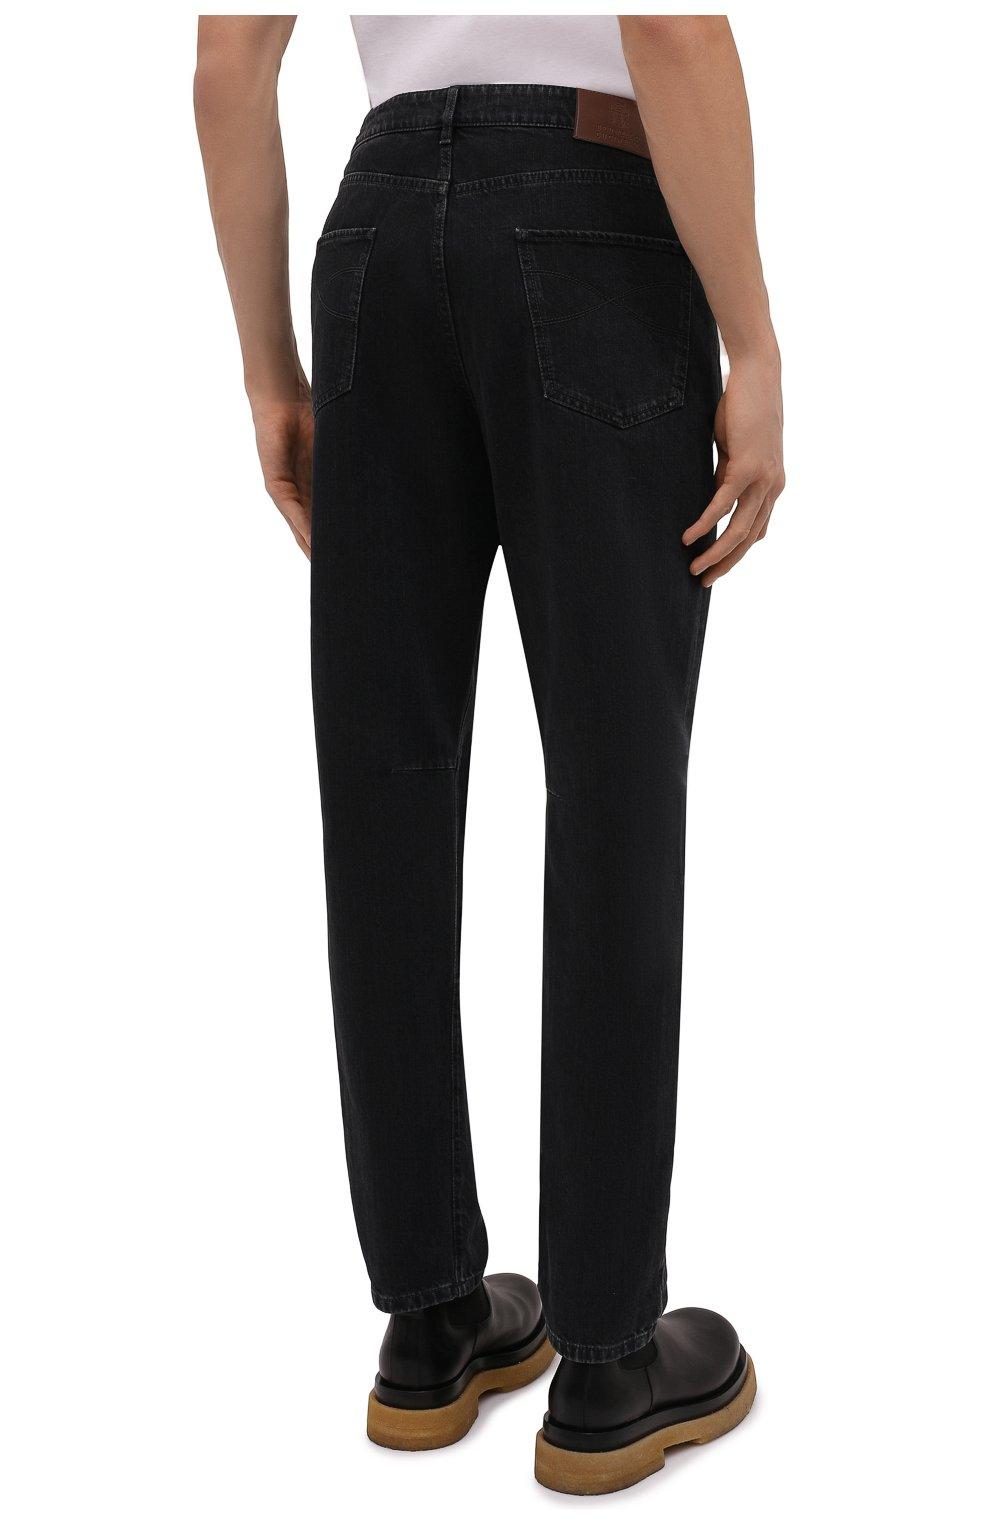 Мужские джинсы BRUNELLO CUCINELLI темно-серого цвета, арт. ME245X1290 | Фото 4